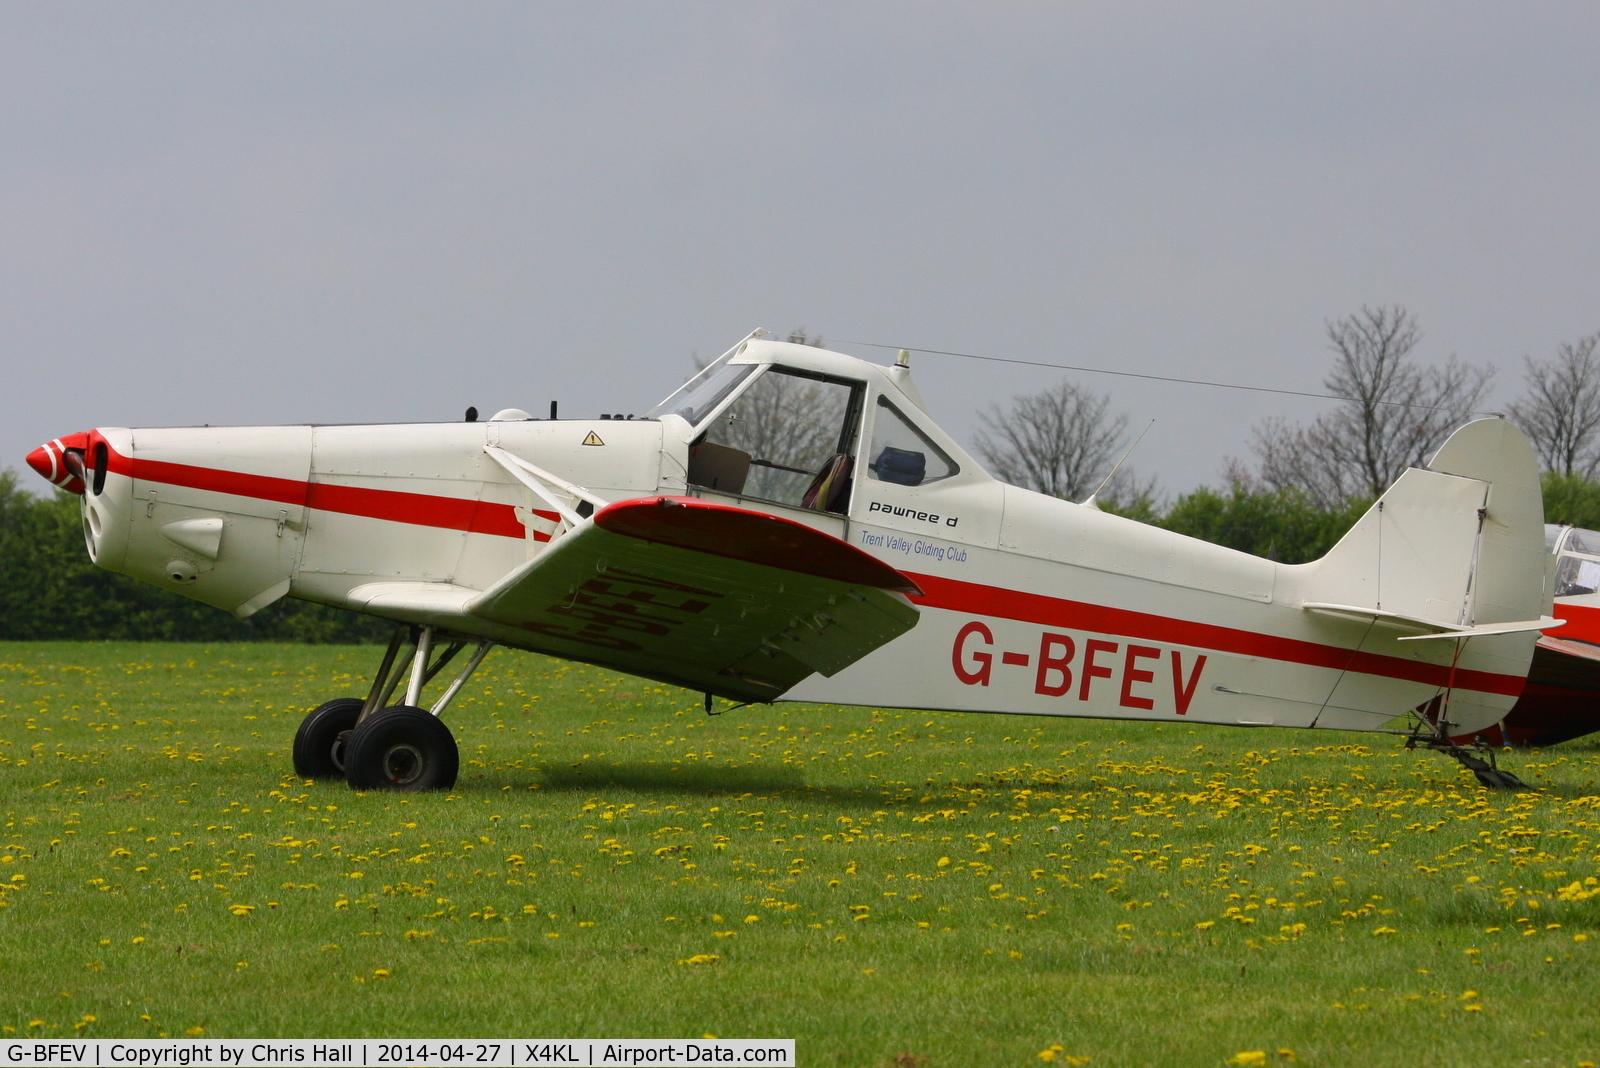 G-BFEV, 1977 Piper PA-25-235 Pawnee C/N 25-7756060, Trent Valley Gliding Club, Kirton in Lindsay